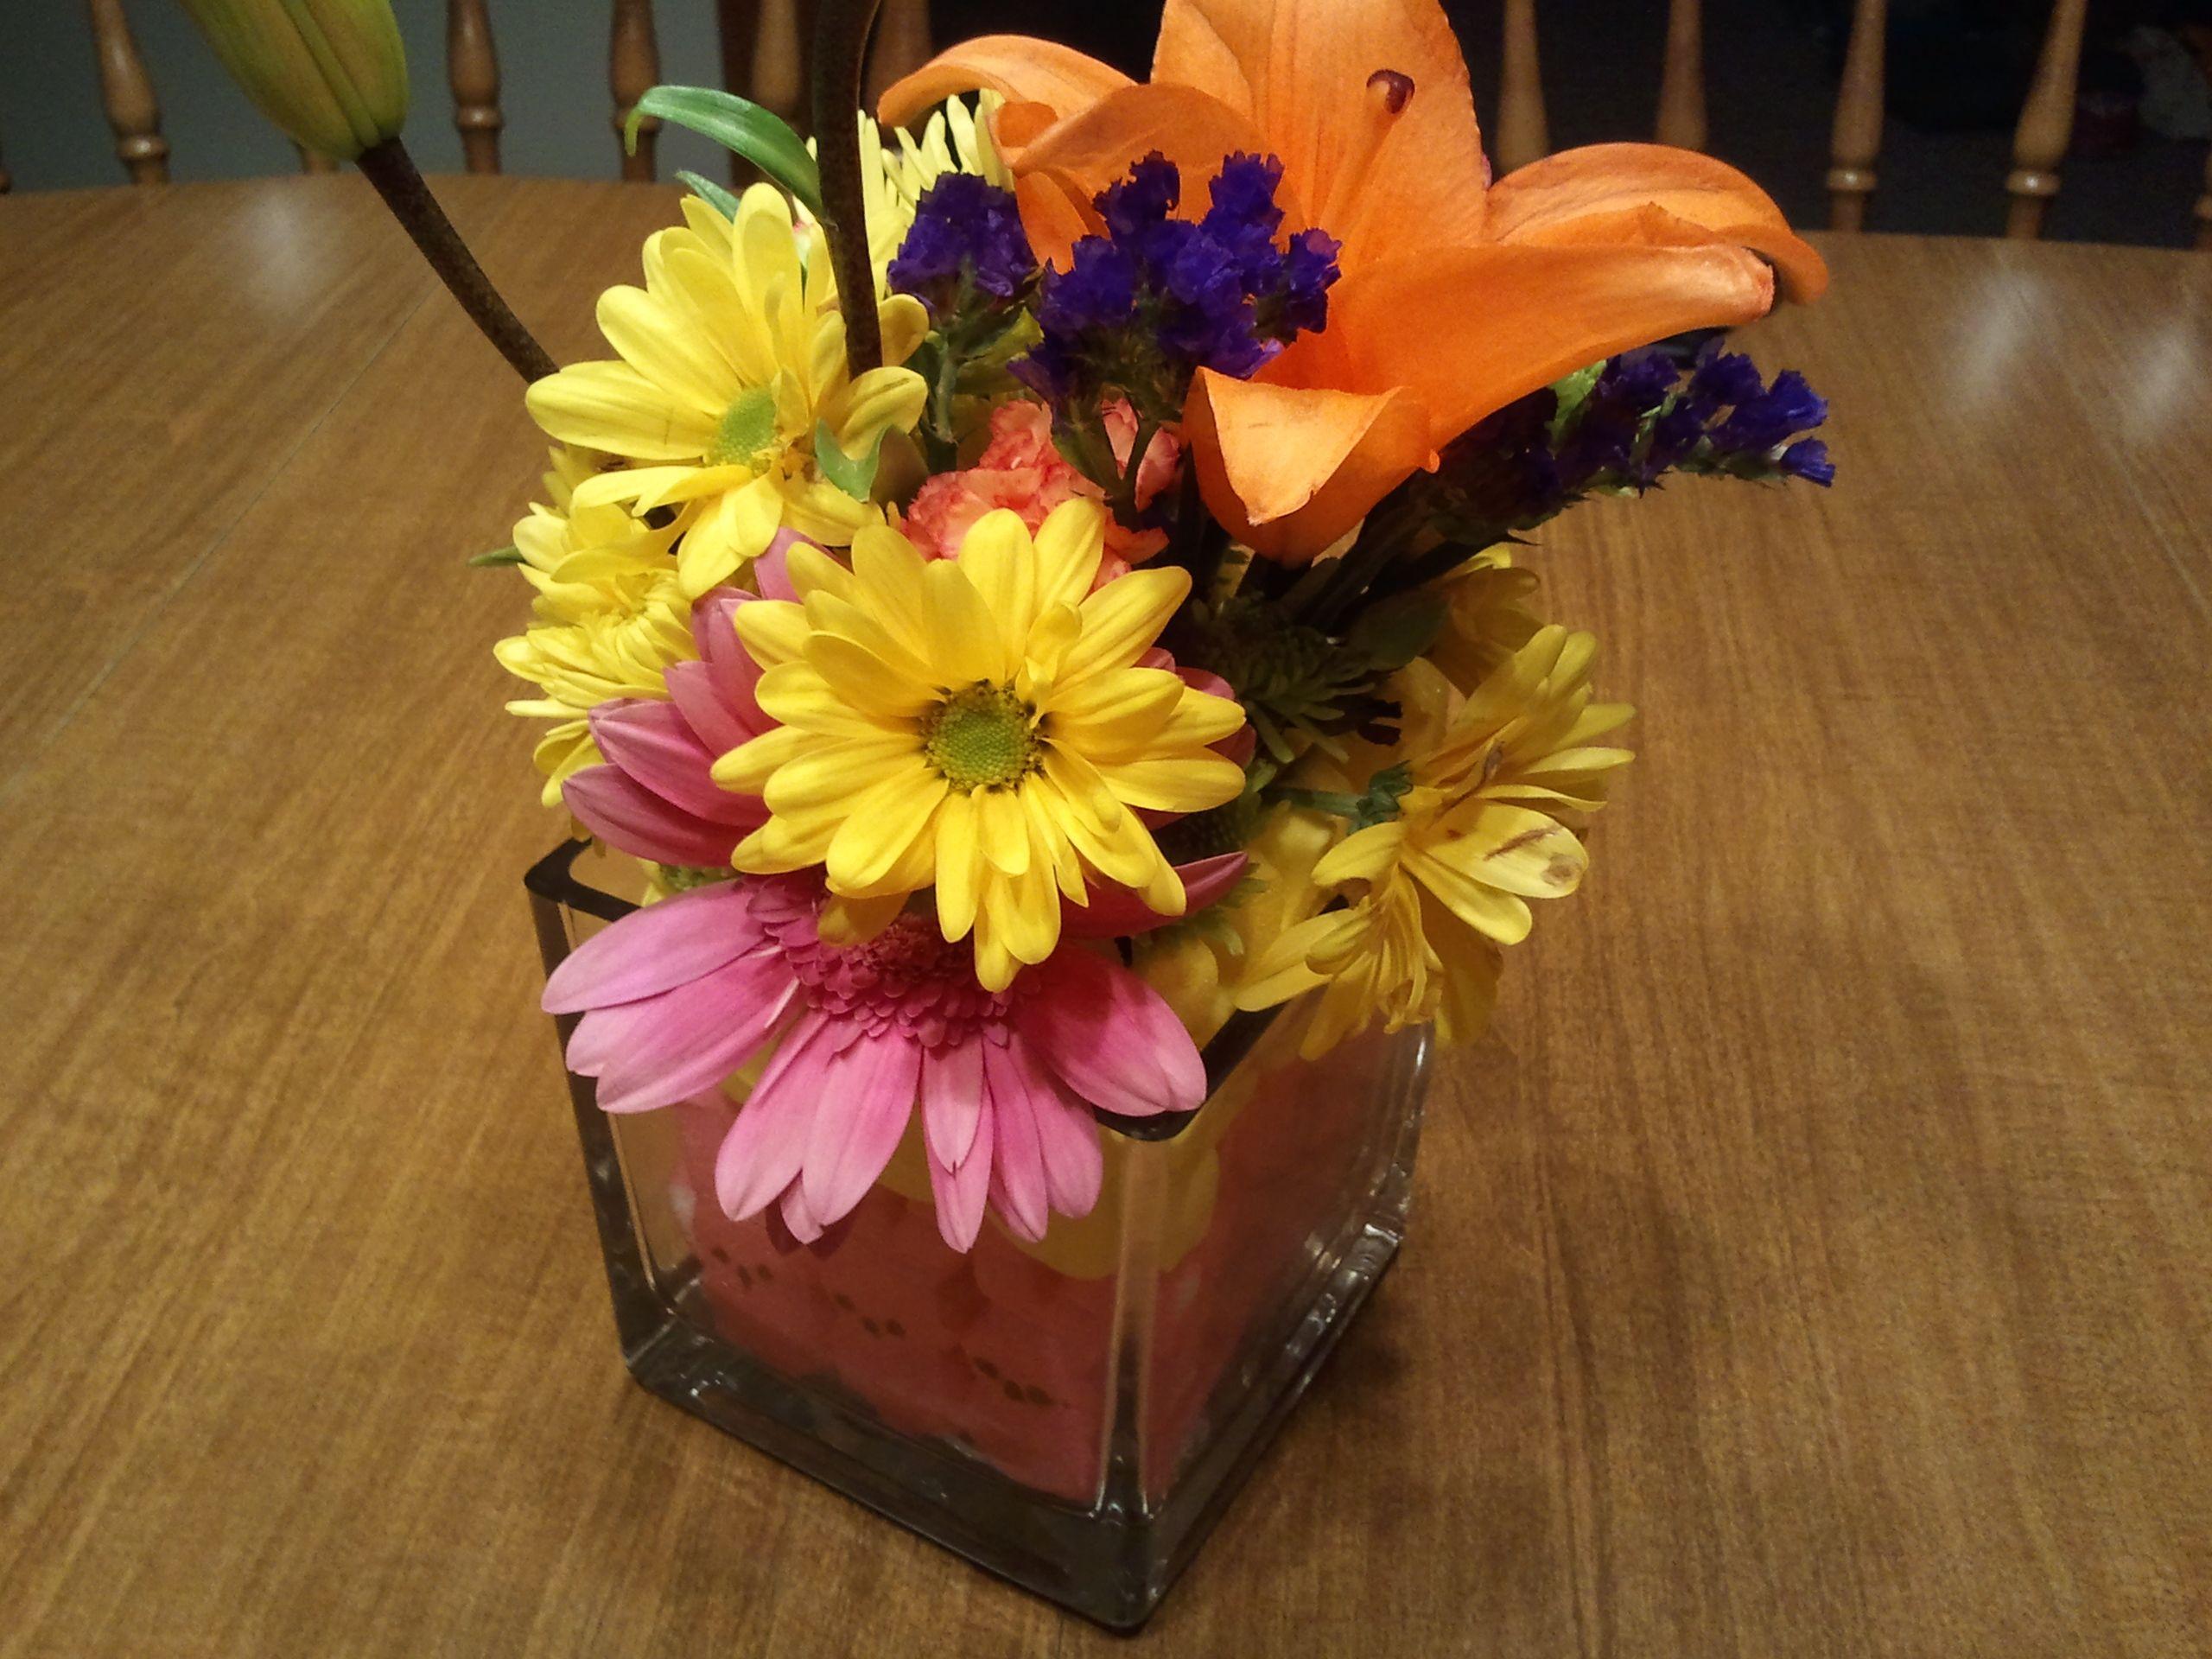 Diy arrange your favorite bouquet of flowers in a small square diy arrange your favorite bouquet of flowers in a small square glass vase and add reviewsmspy